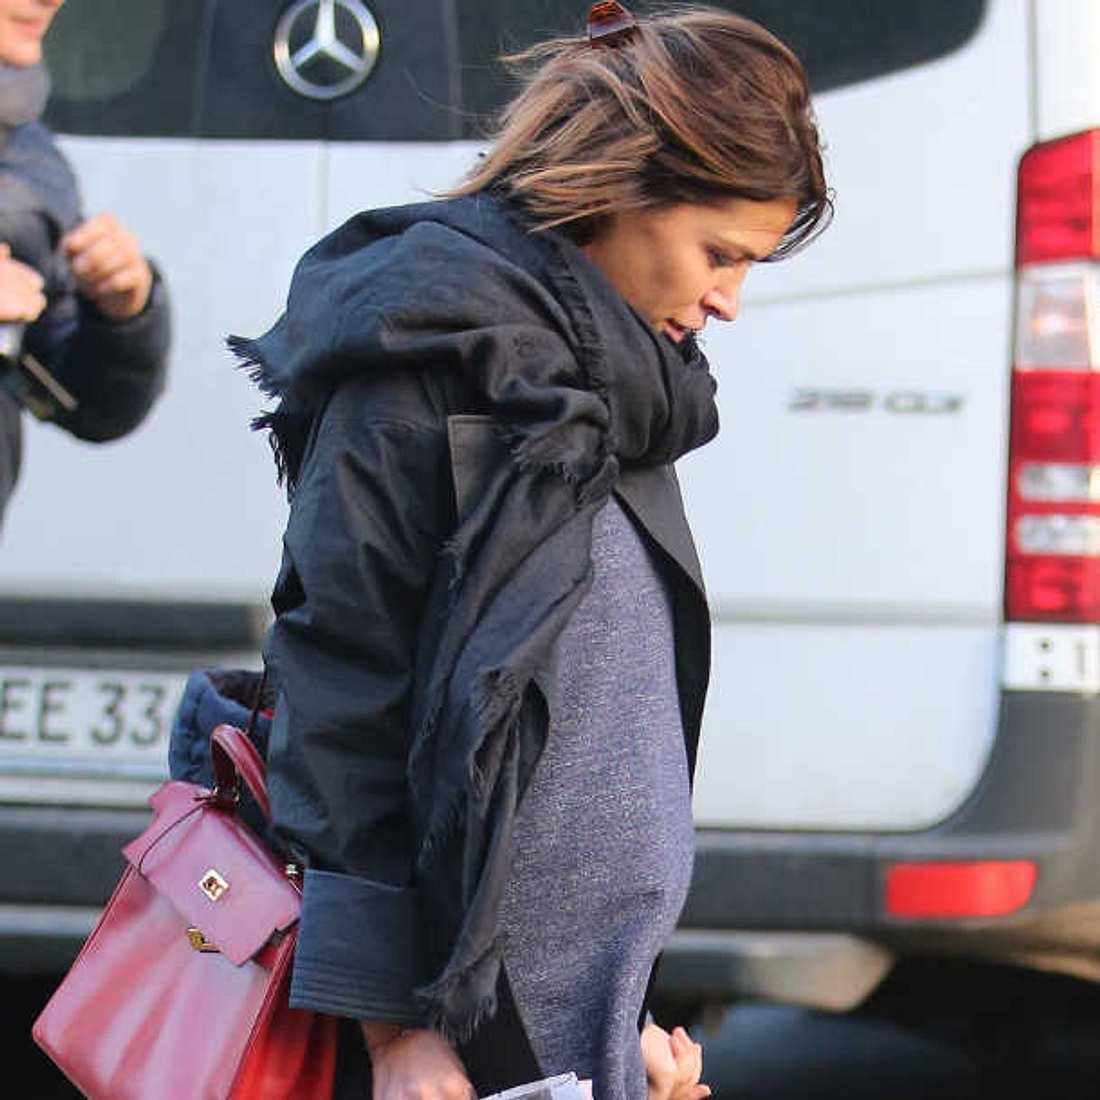 sabia-boulahrouz-zeigt-babykugel